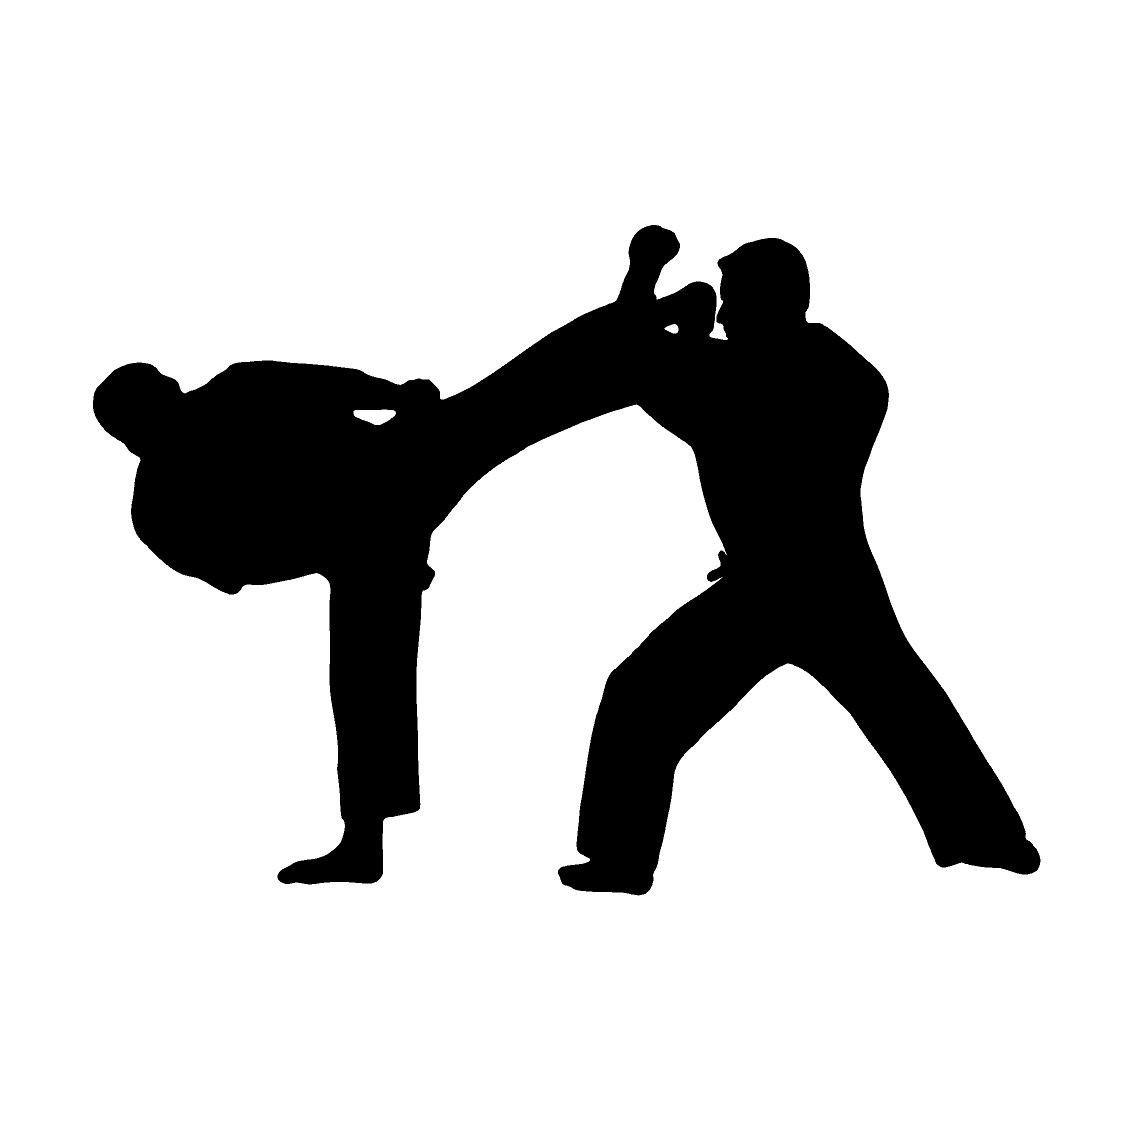 Karate Martial Arts Silhouette Decals Custom Vinyl Laptop Car Truck Window Stickers Martial Arts Karate Martial Arts Karate [ 1143 x 1139 Pixel ]